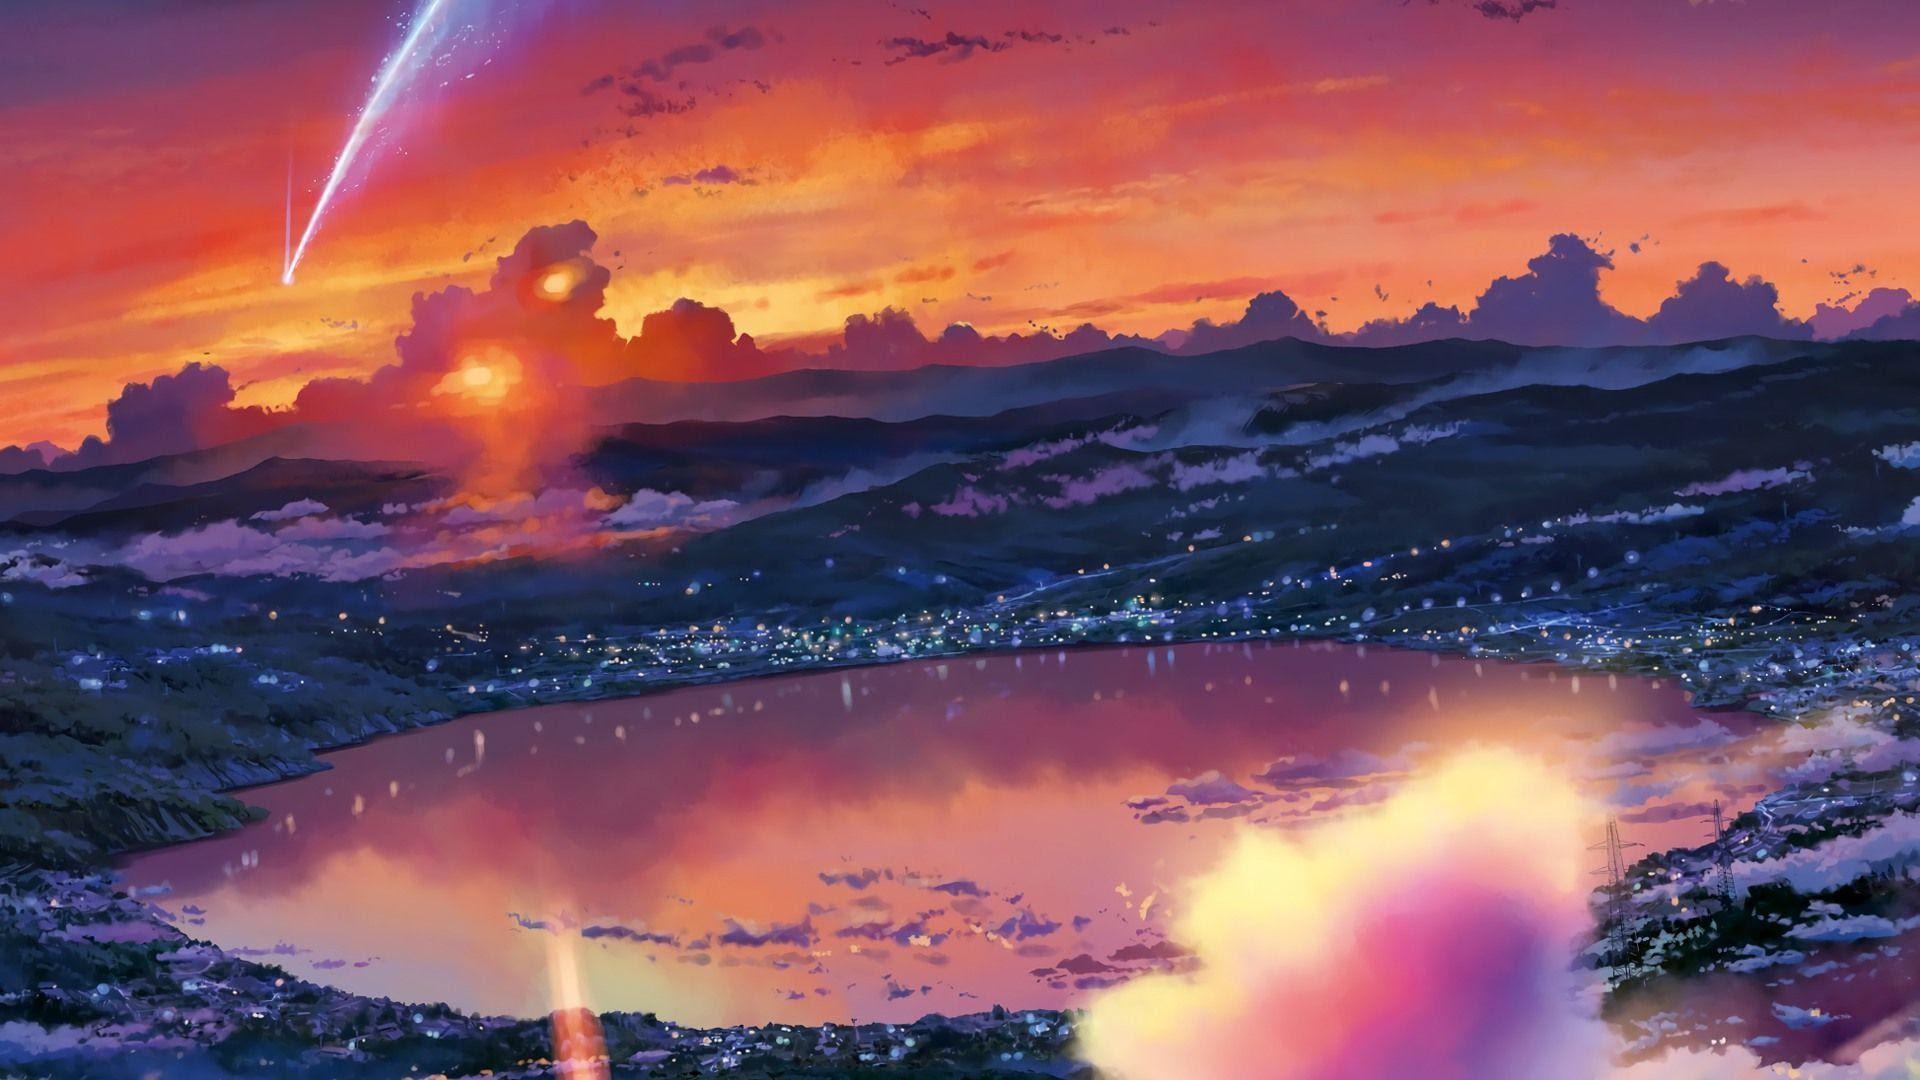 700 Koleksi Wallpaper Hp Anime Kimi No Nawa Gratis